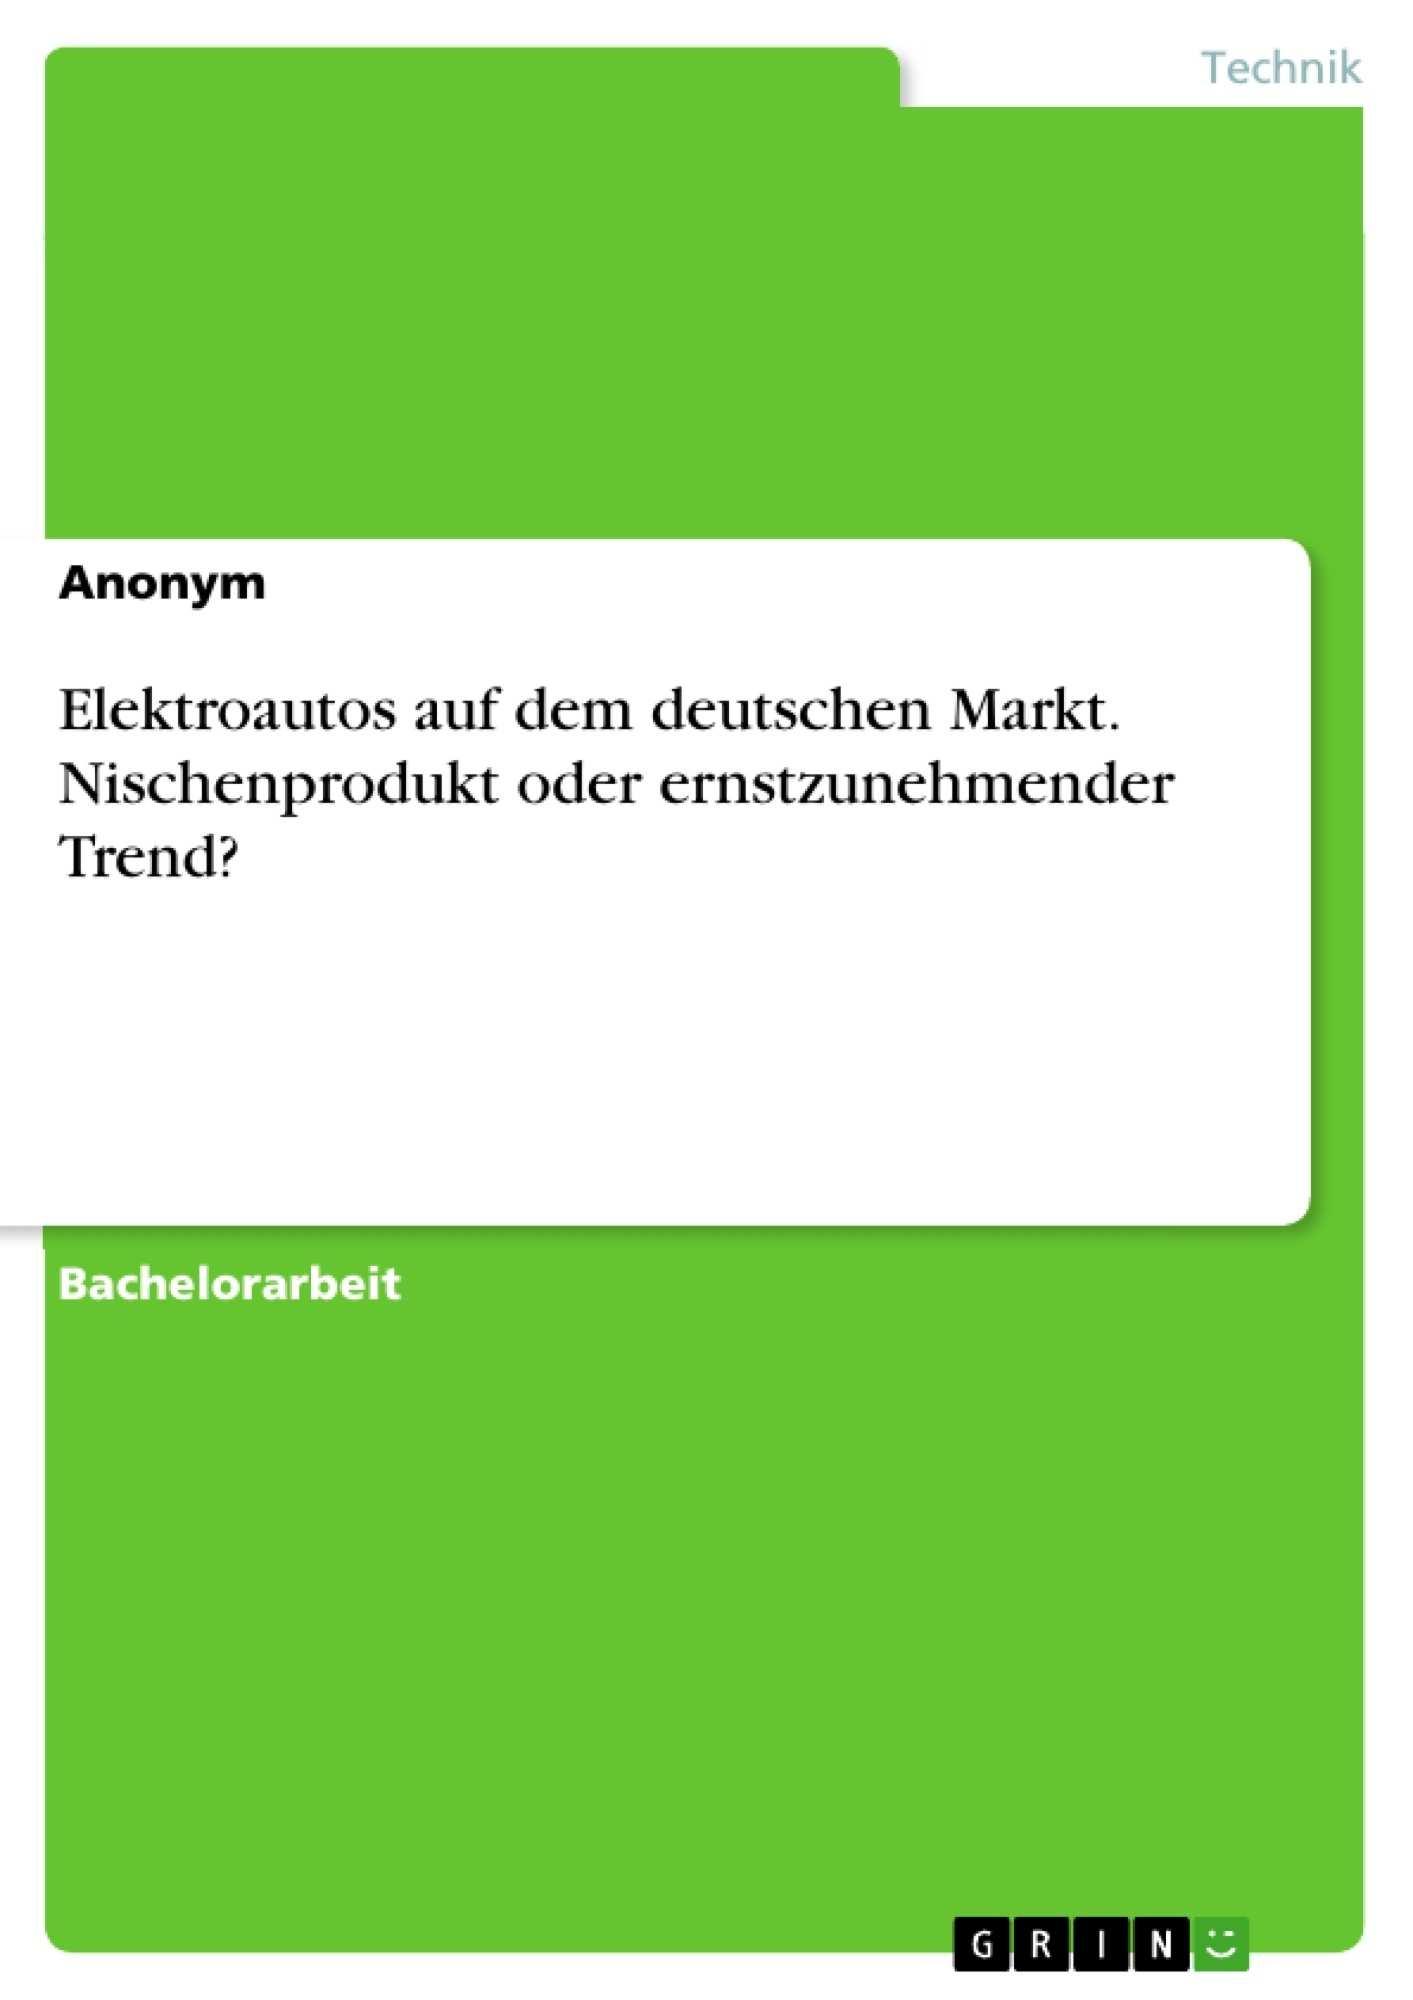 Elektroautos Auf Dem Deutschen Markt Diplomarbeiten24 De Diplomarbeiten24 De